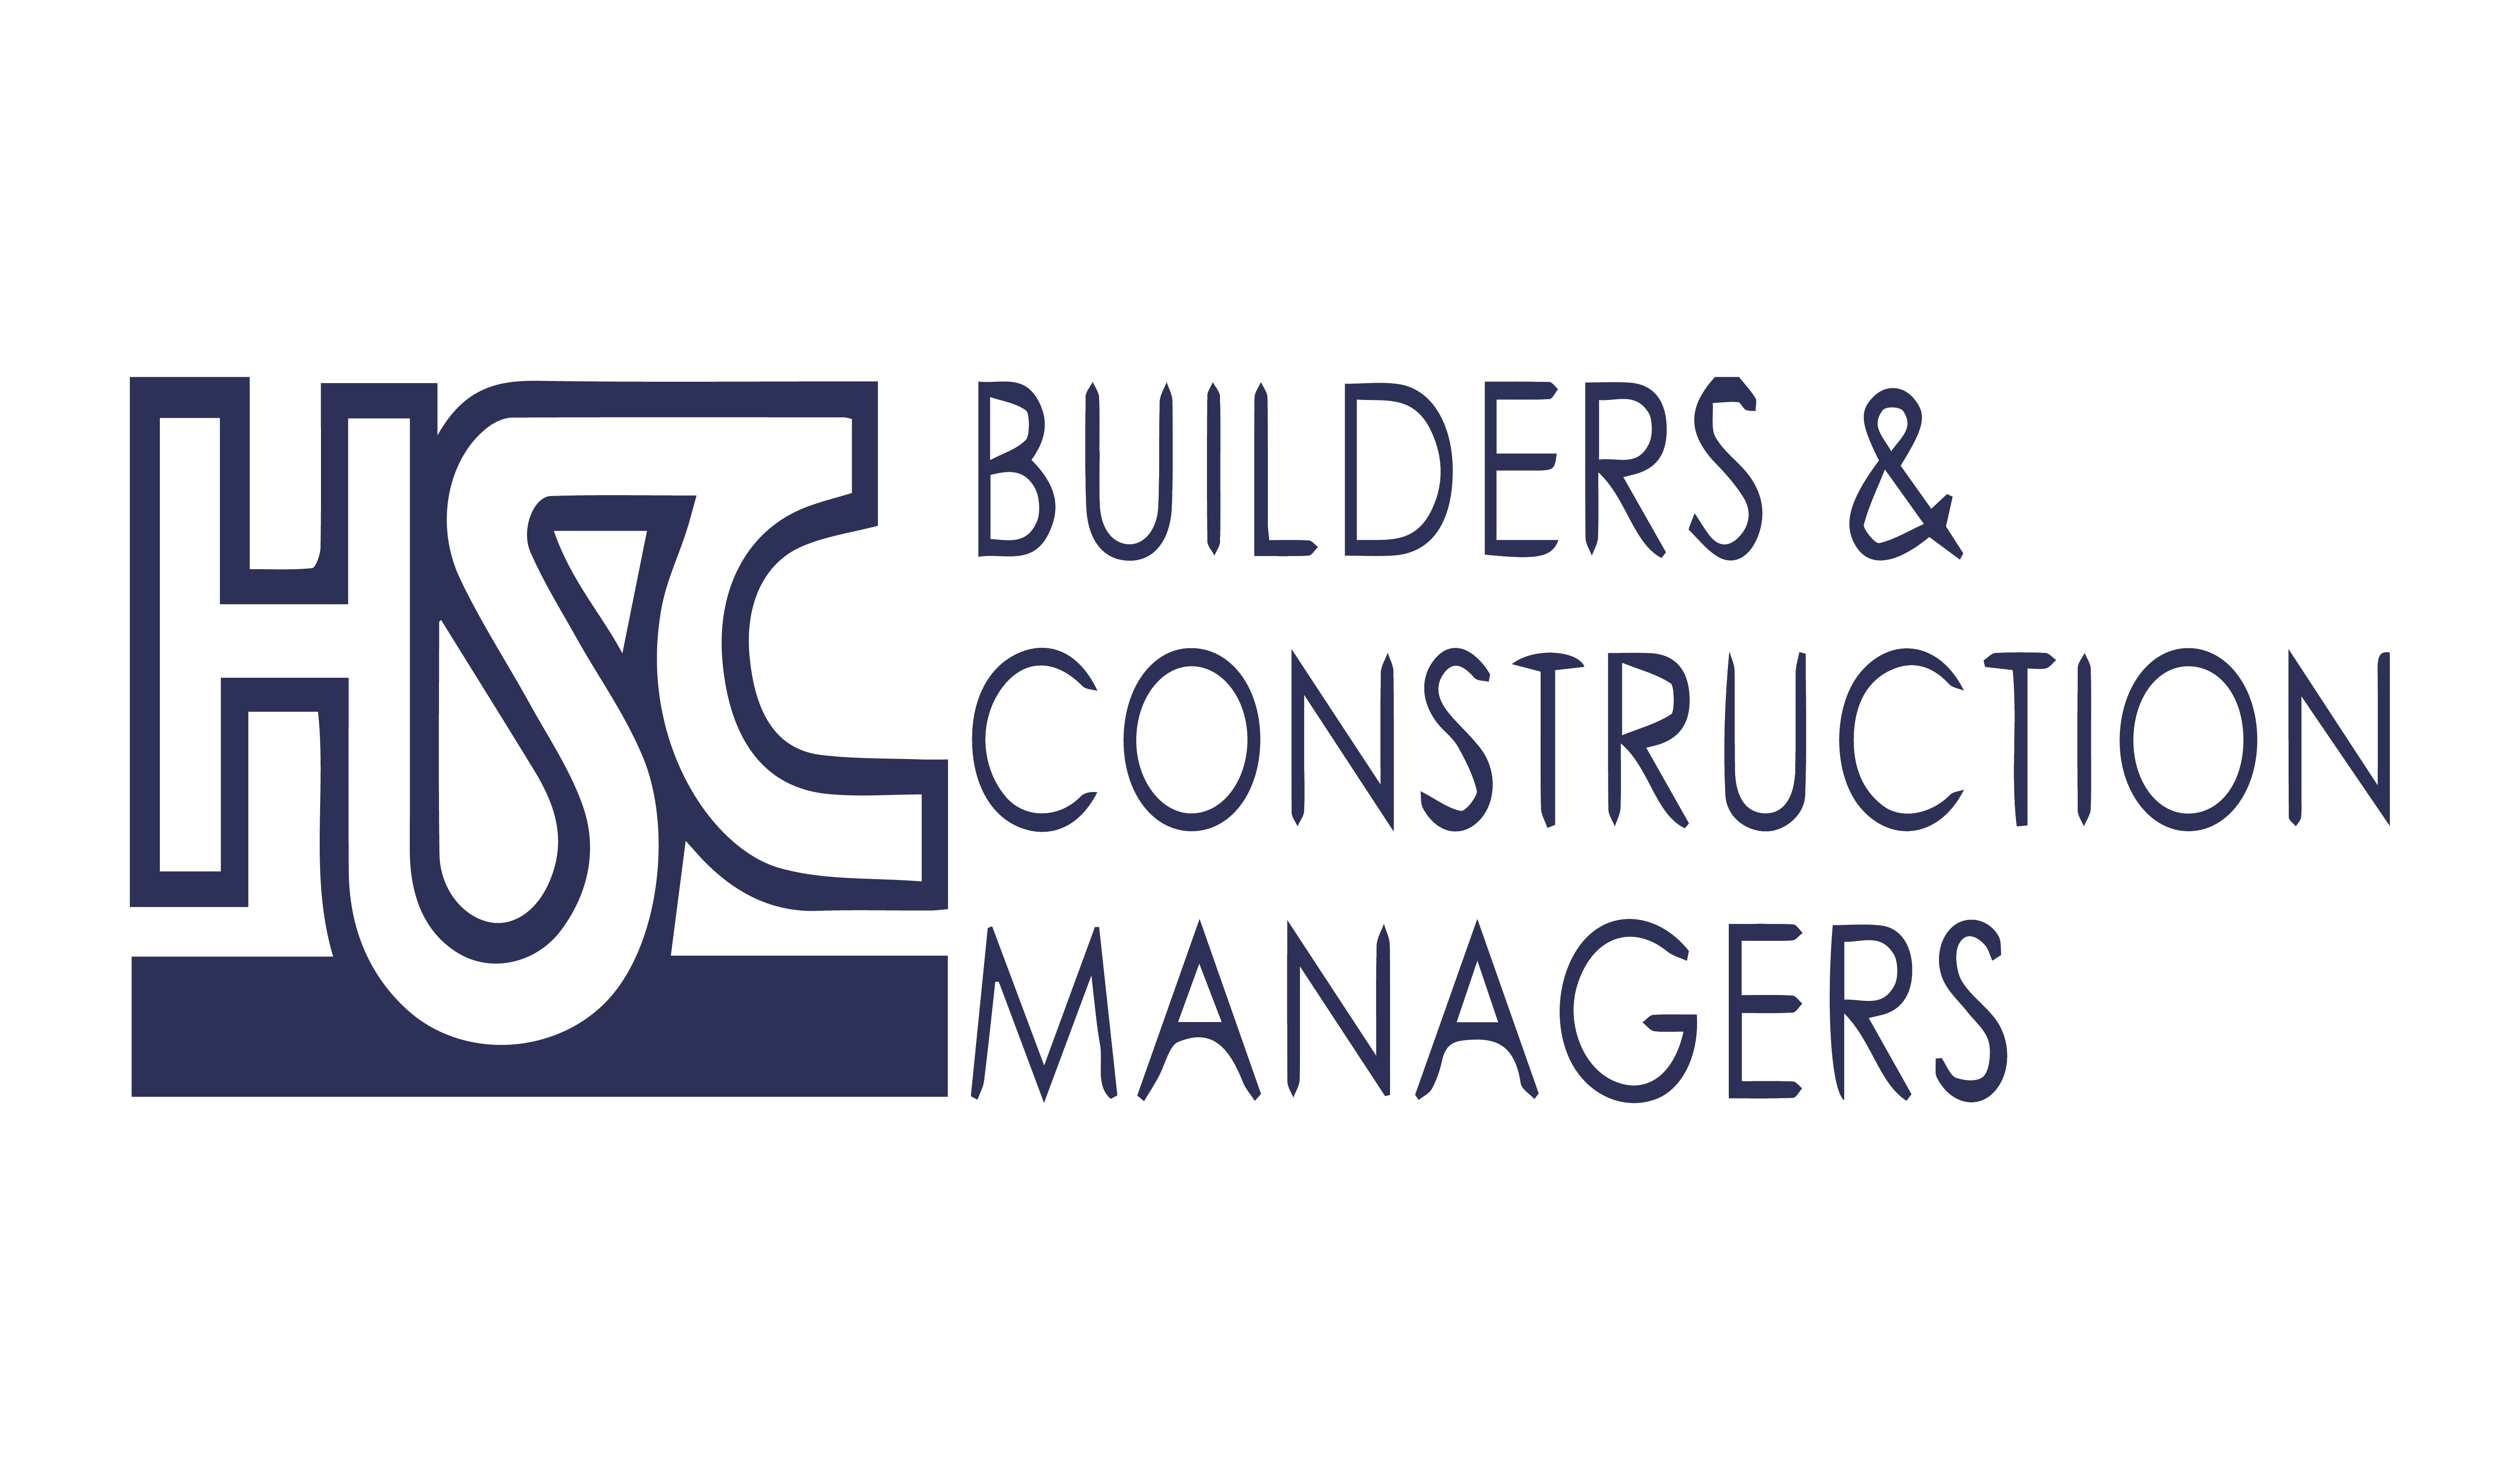 our client hsc builders & construction managers